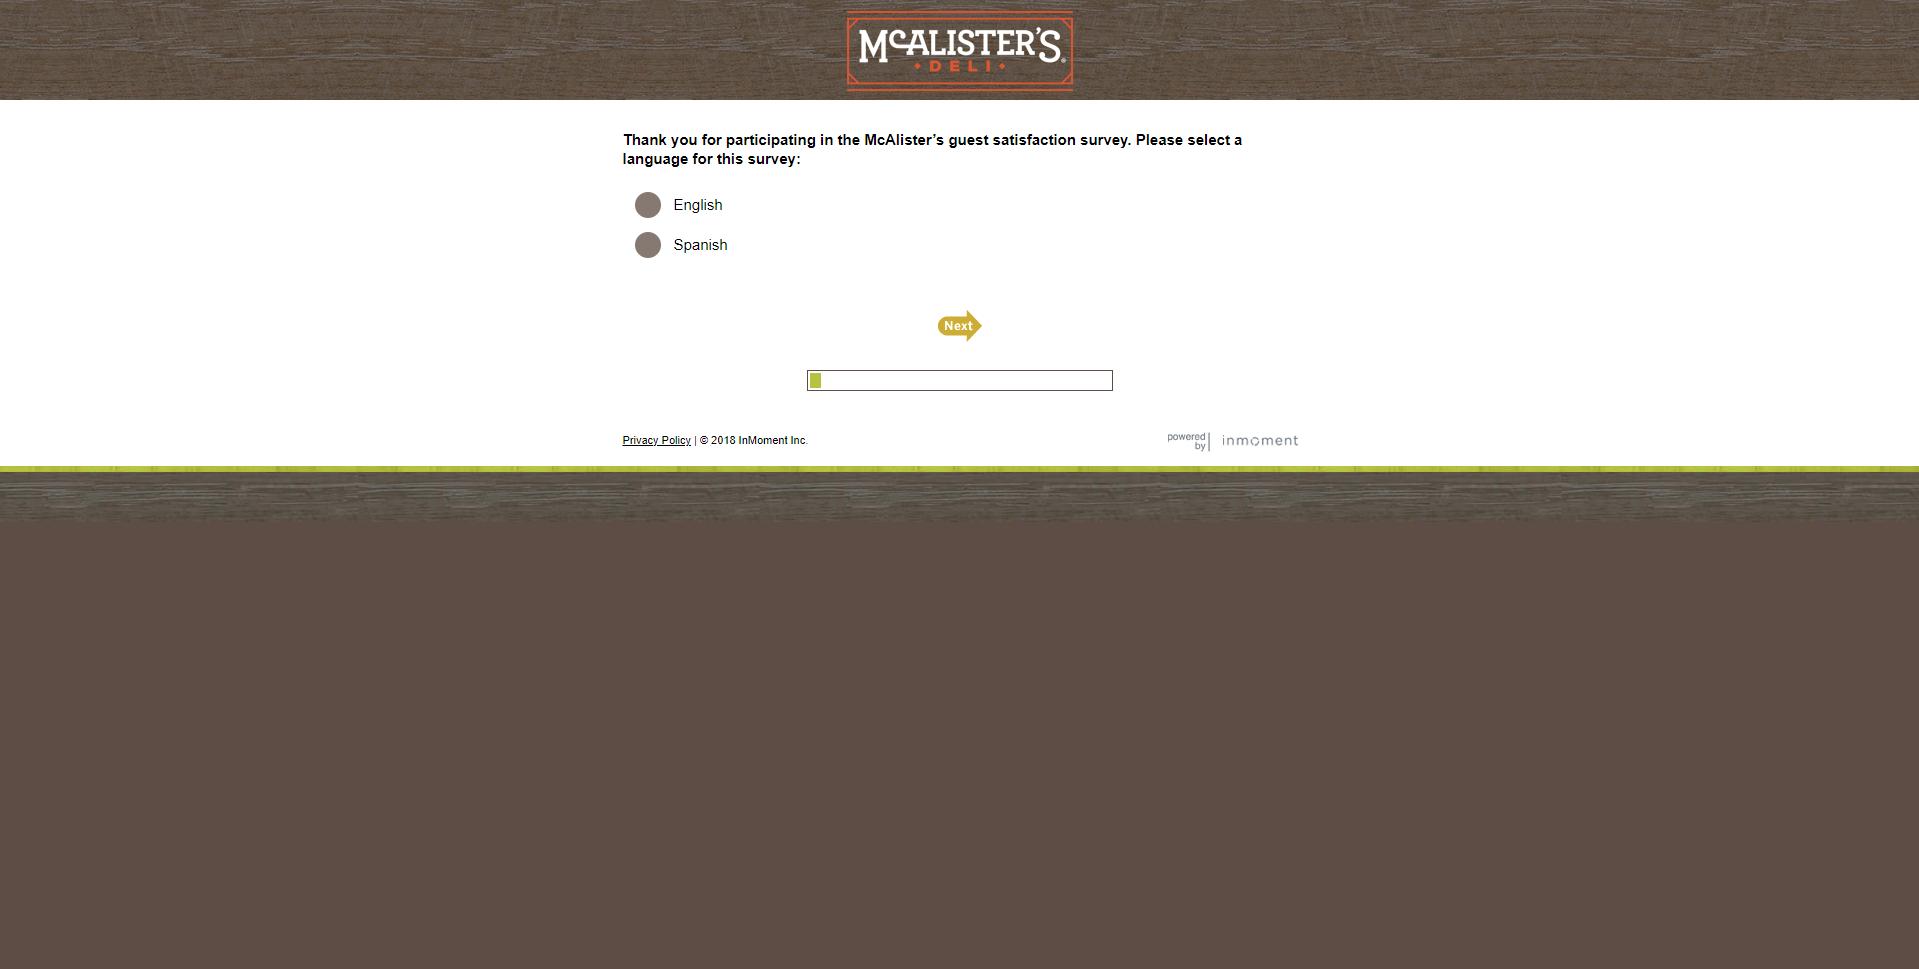 www.talktomcalisters.com